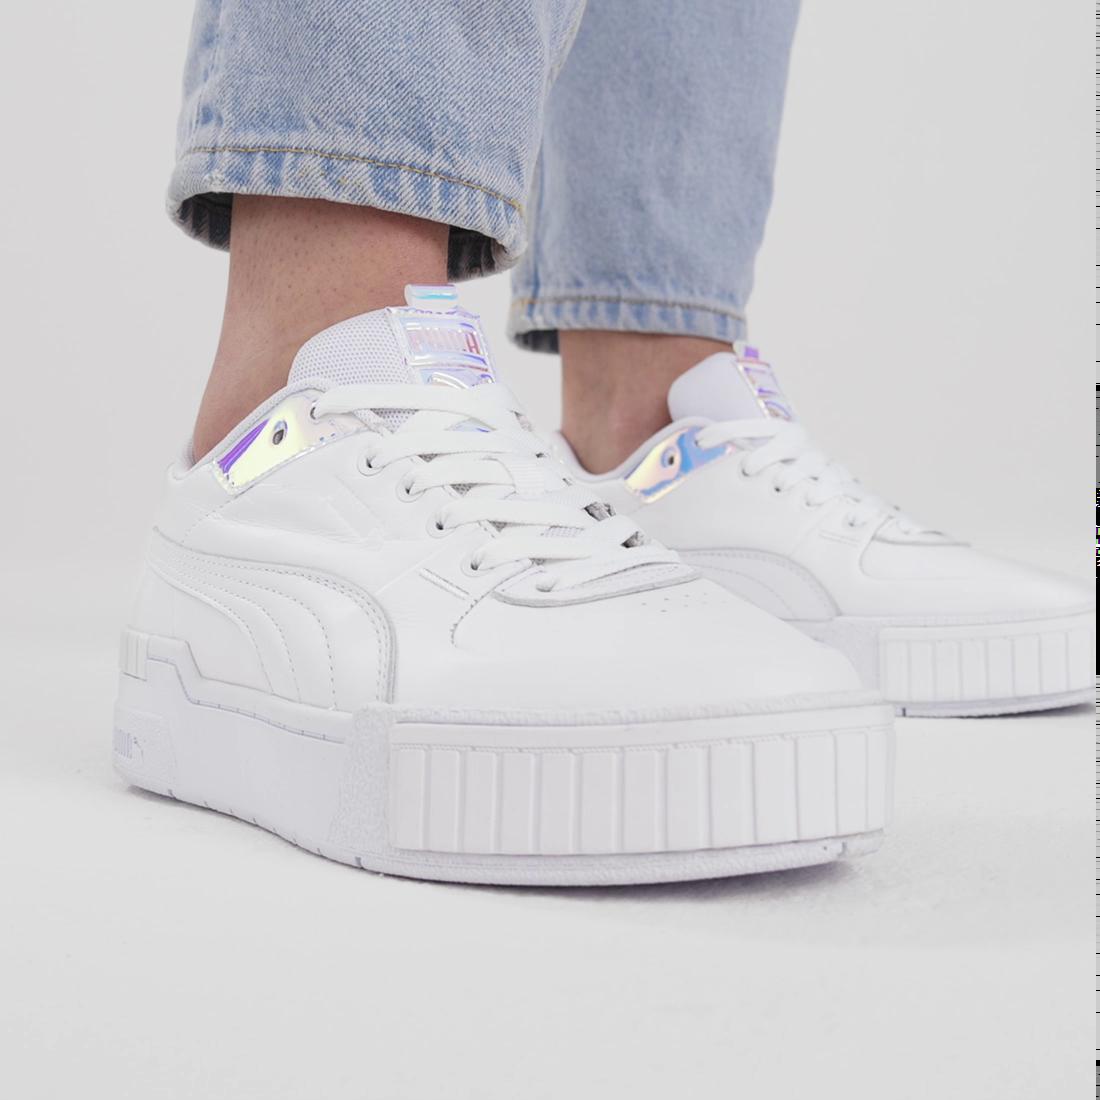 Image PUMA Cali Sport Glow Women's Sneakers #8